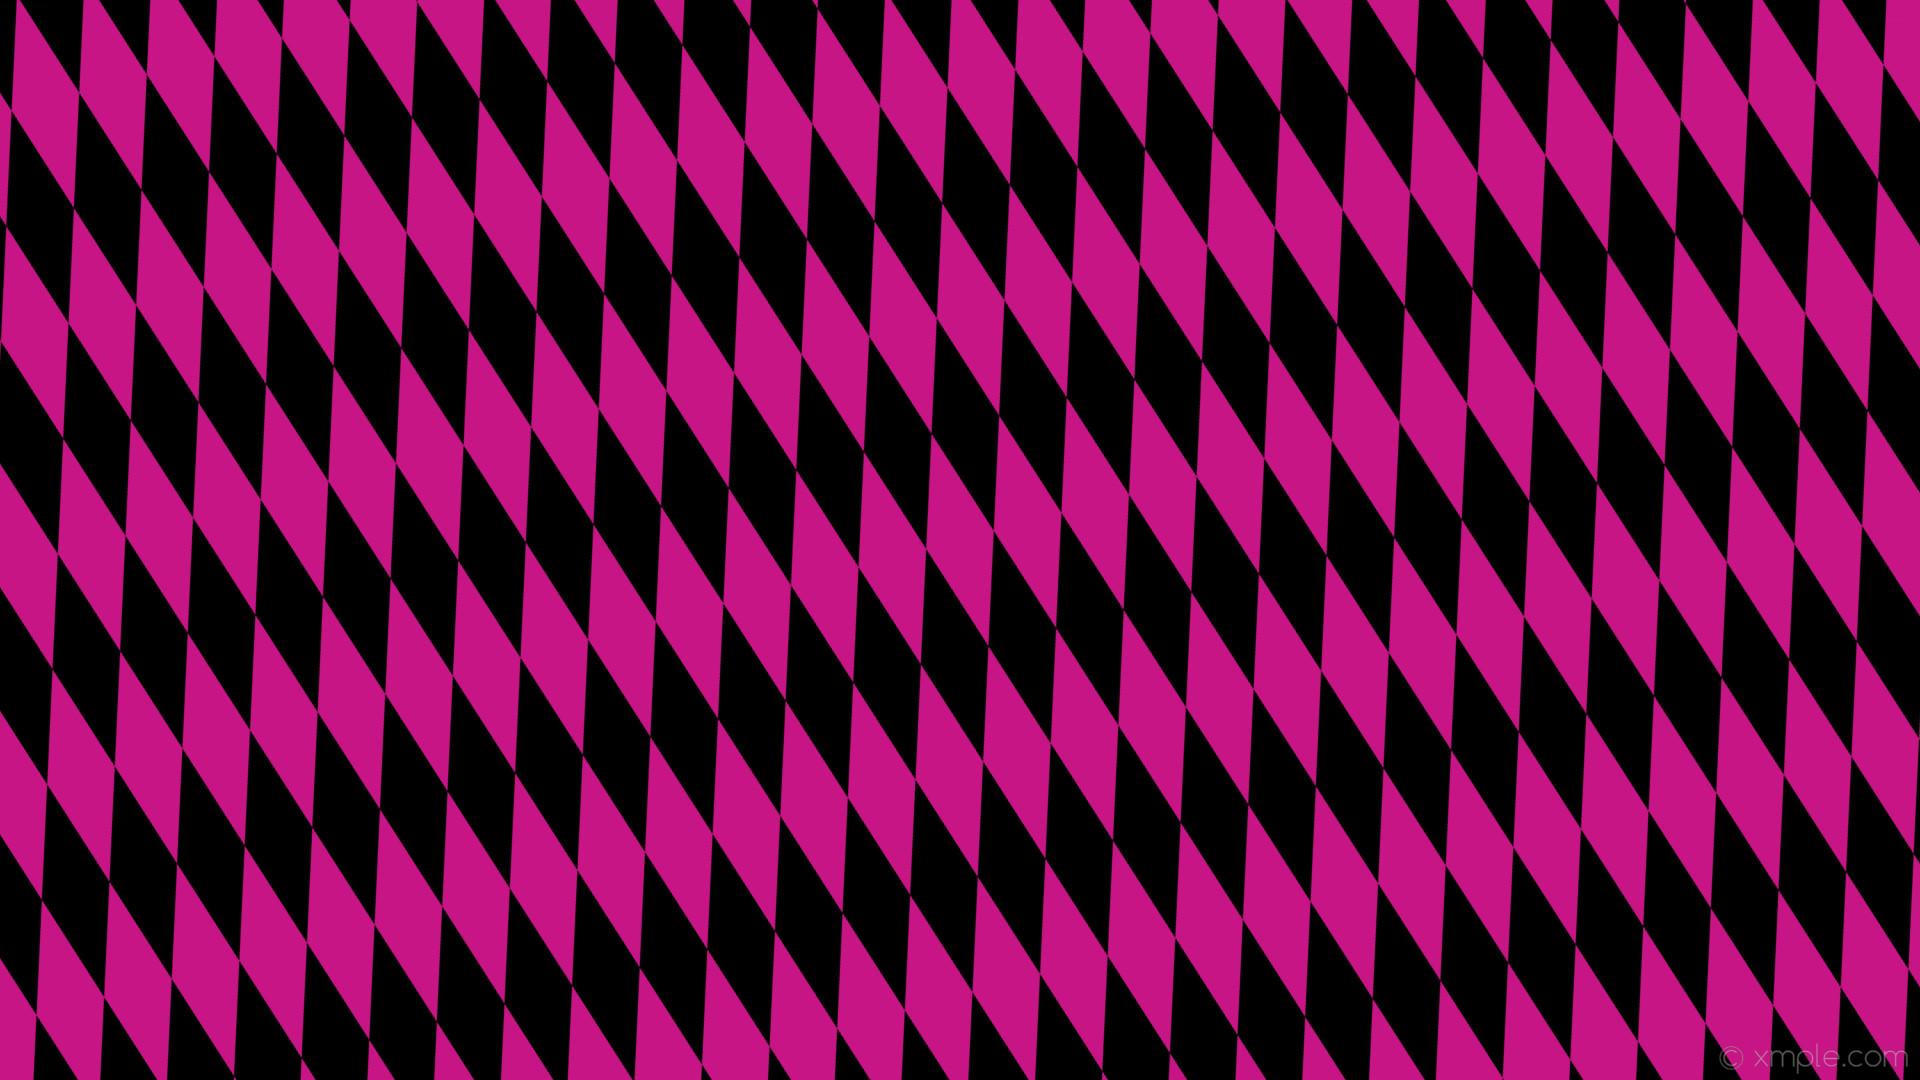 wallpaper lozenge rhombus black pink diamond medium violet red #c71585  #000000 105° 220px